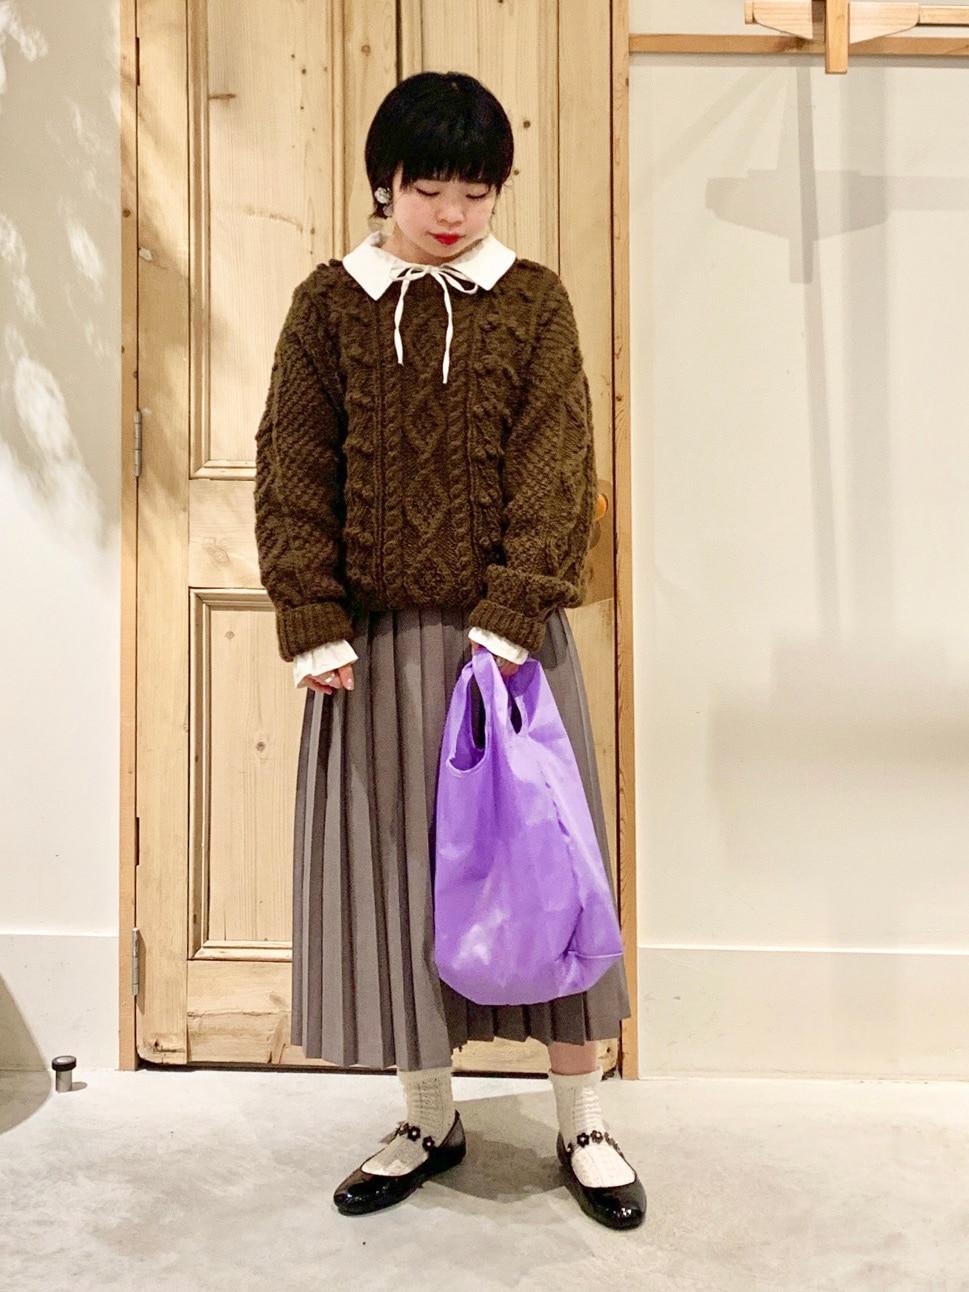 Malle chambre de charme 調布パルコ 身長:154cm 2020.12.16